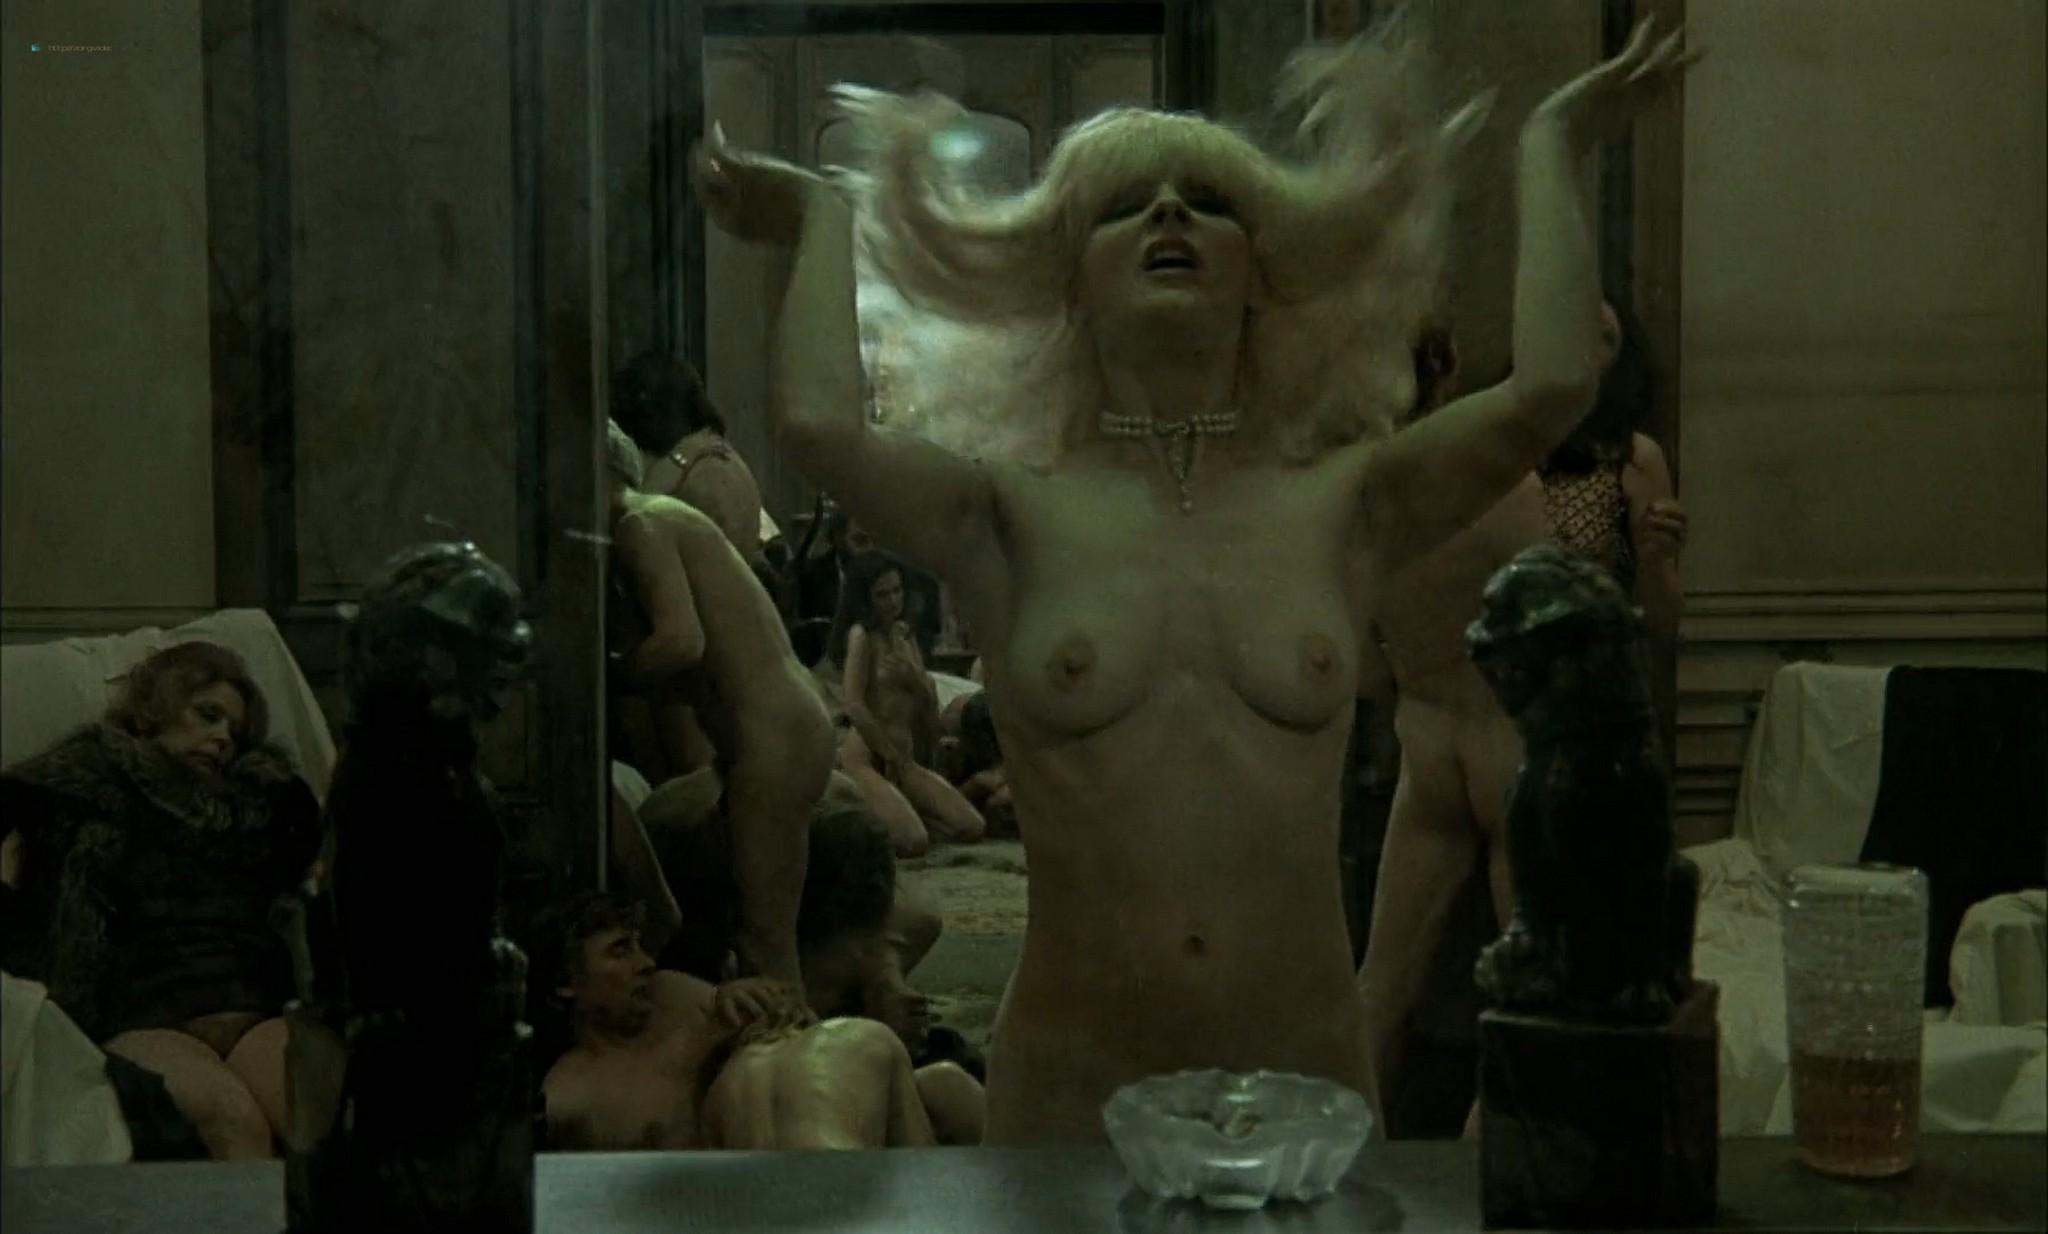 Romy Schneider nude butt Nadia Vasil bush others orgy - L'important c'est d'aimer (FR-1975) HD 1080p BluRay (12)